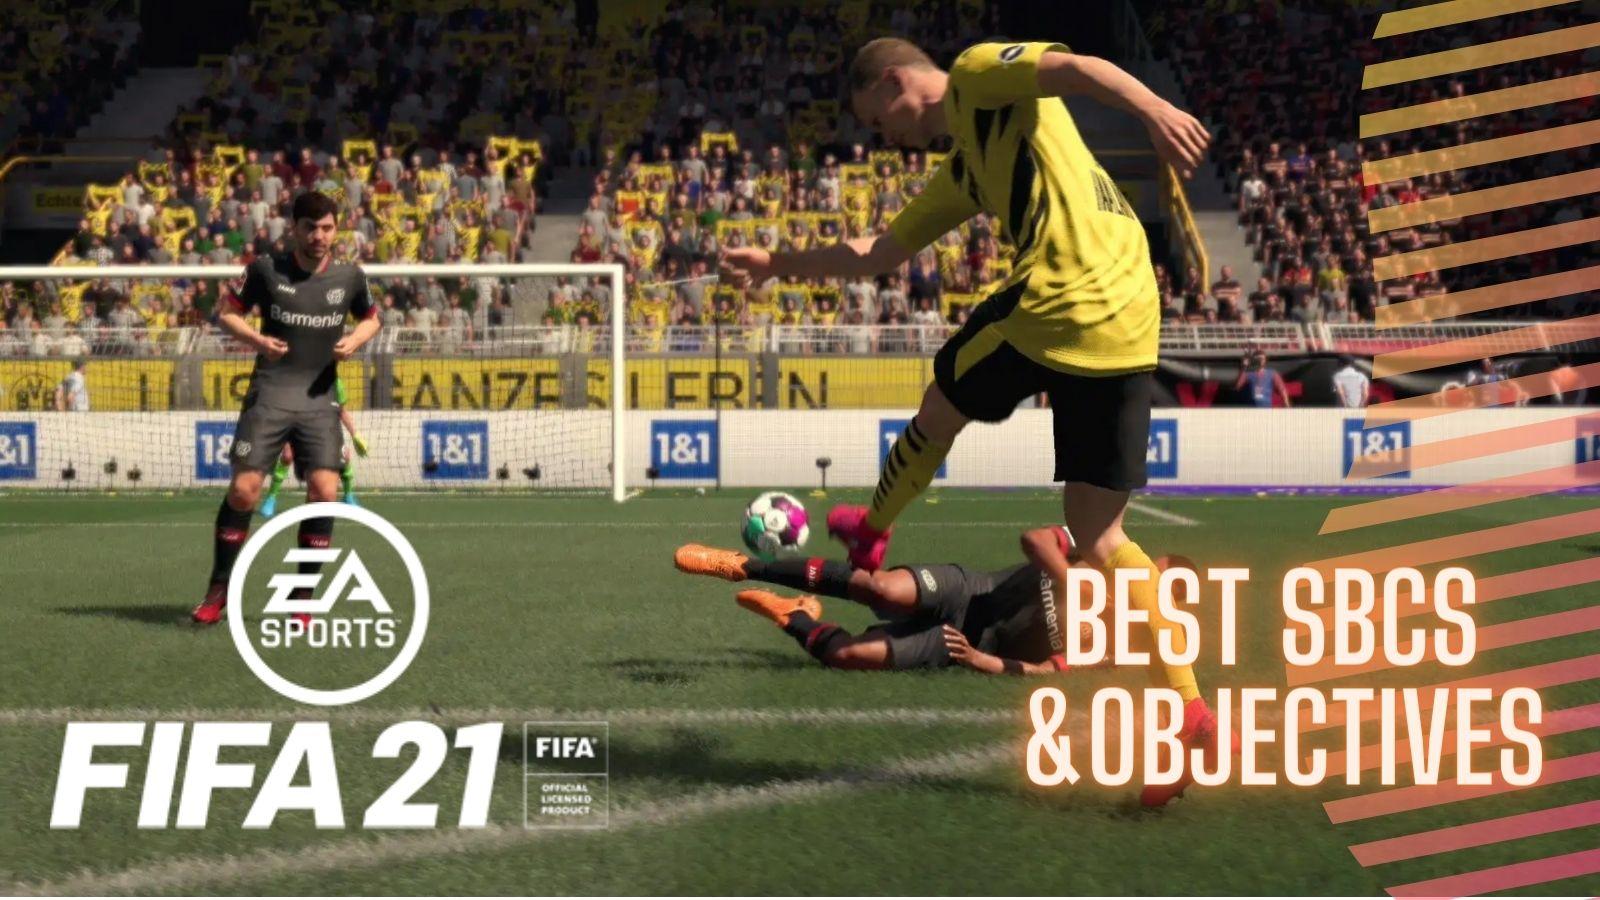 Best FIFA 21 FUT SBCs and Objectives